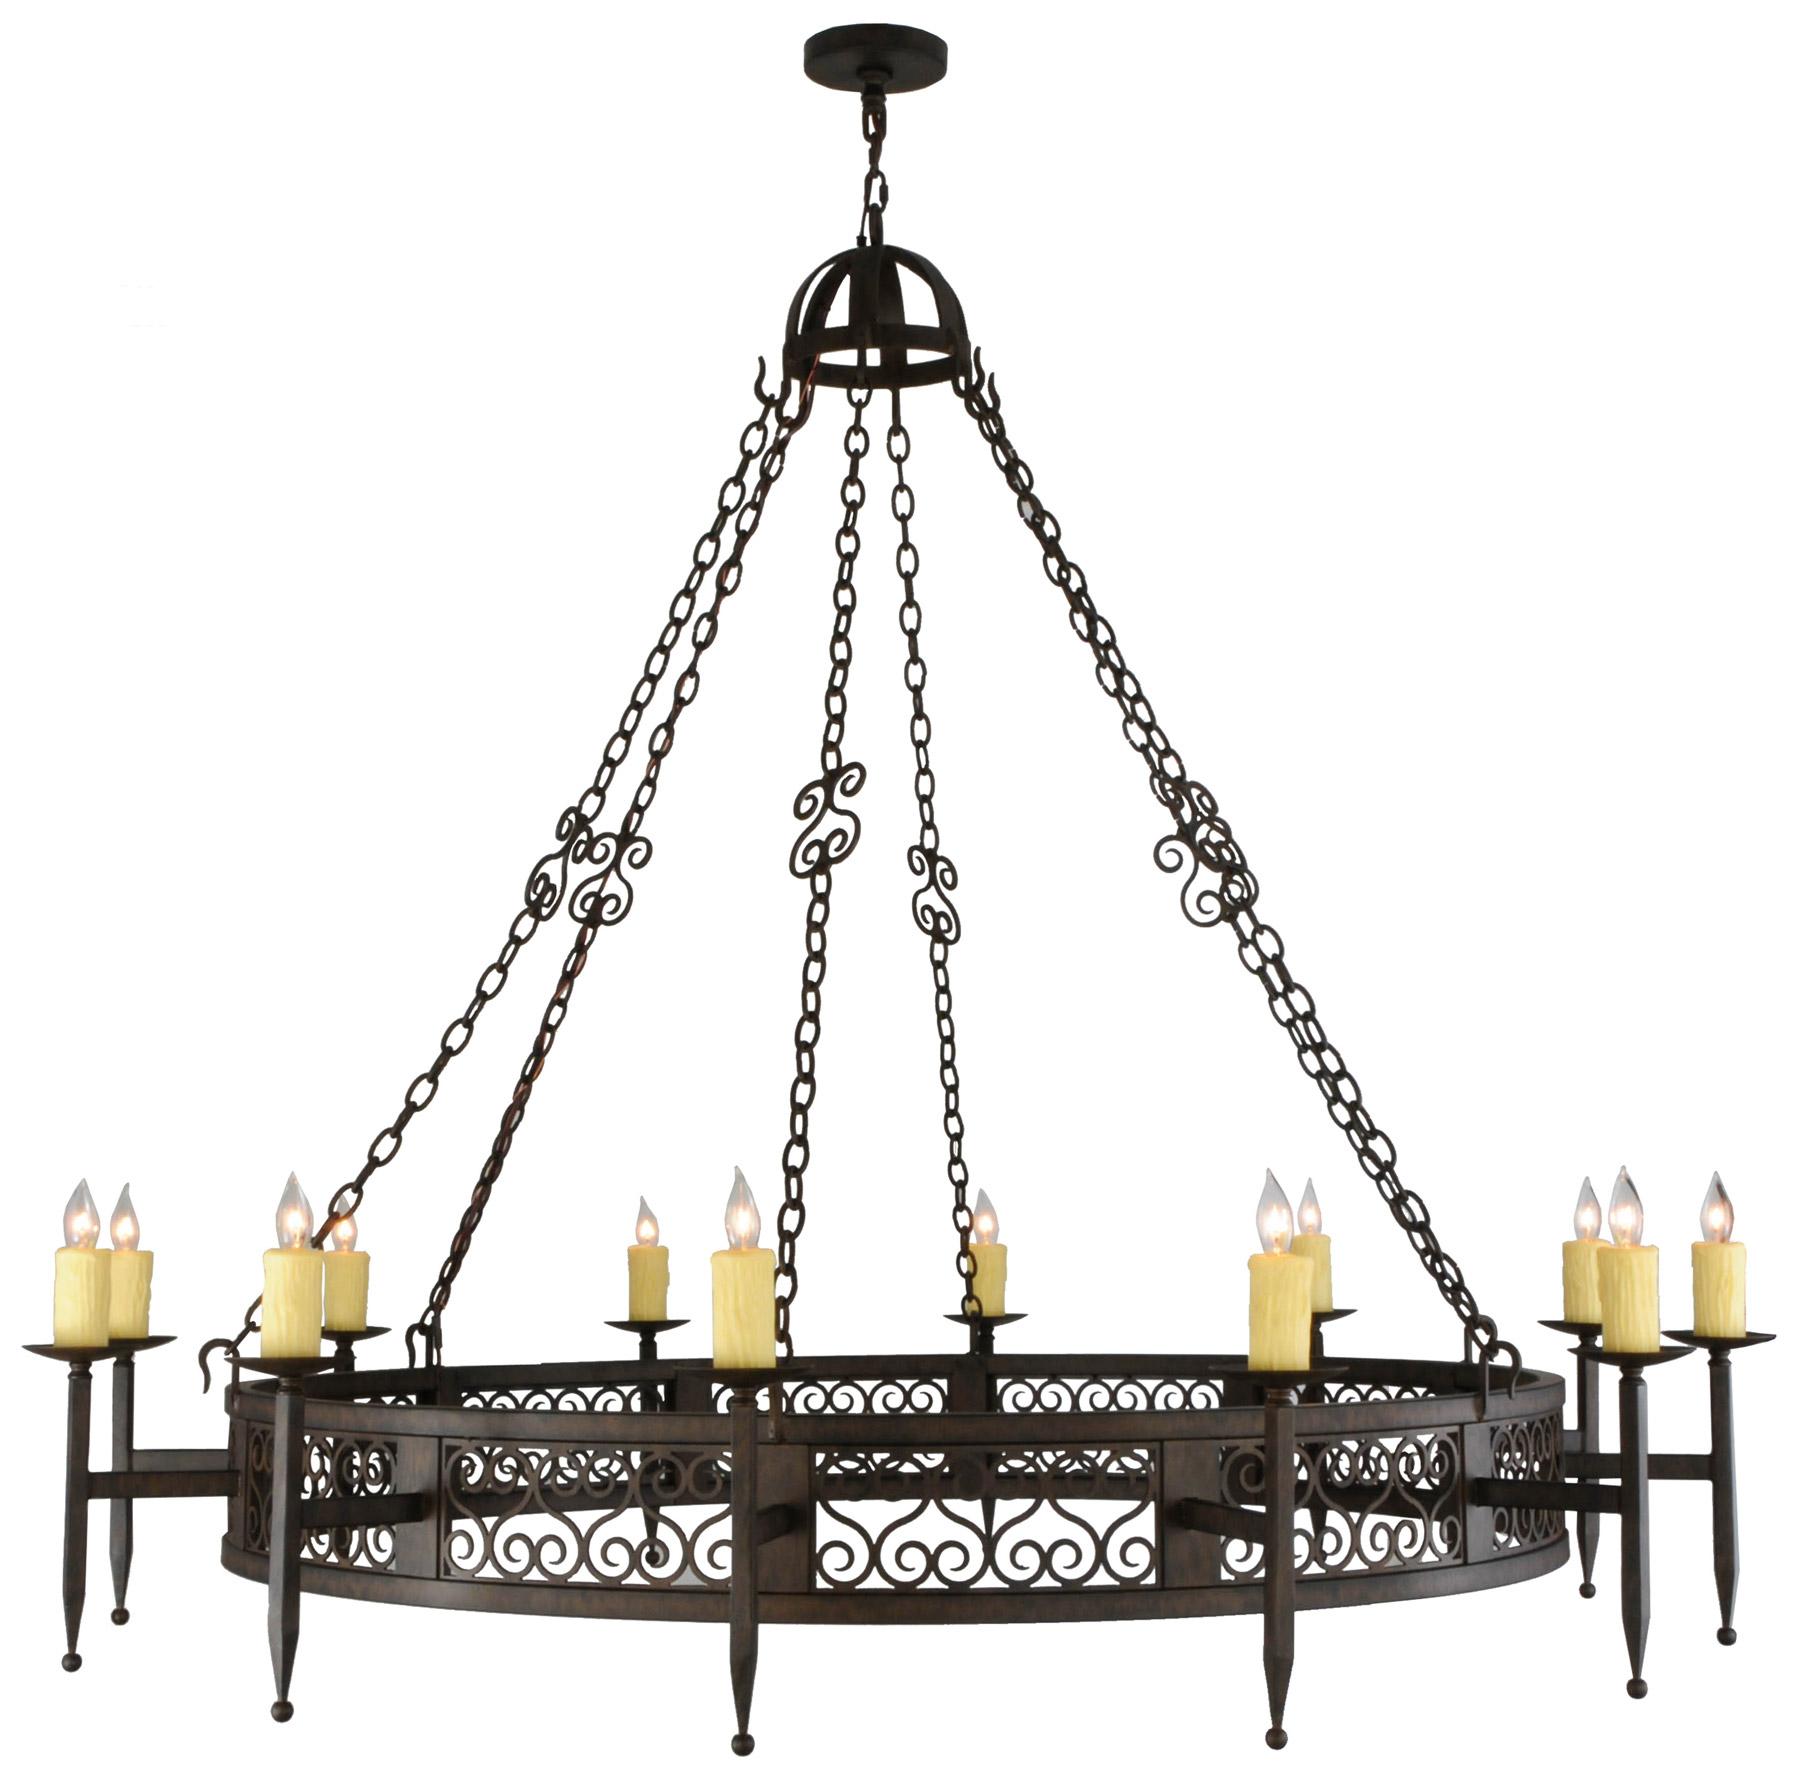 Meyda 142552 gothic chandelier aloadofball Images